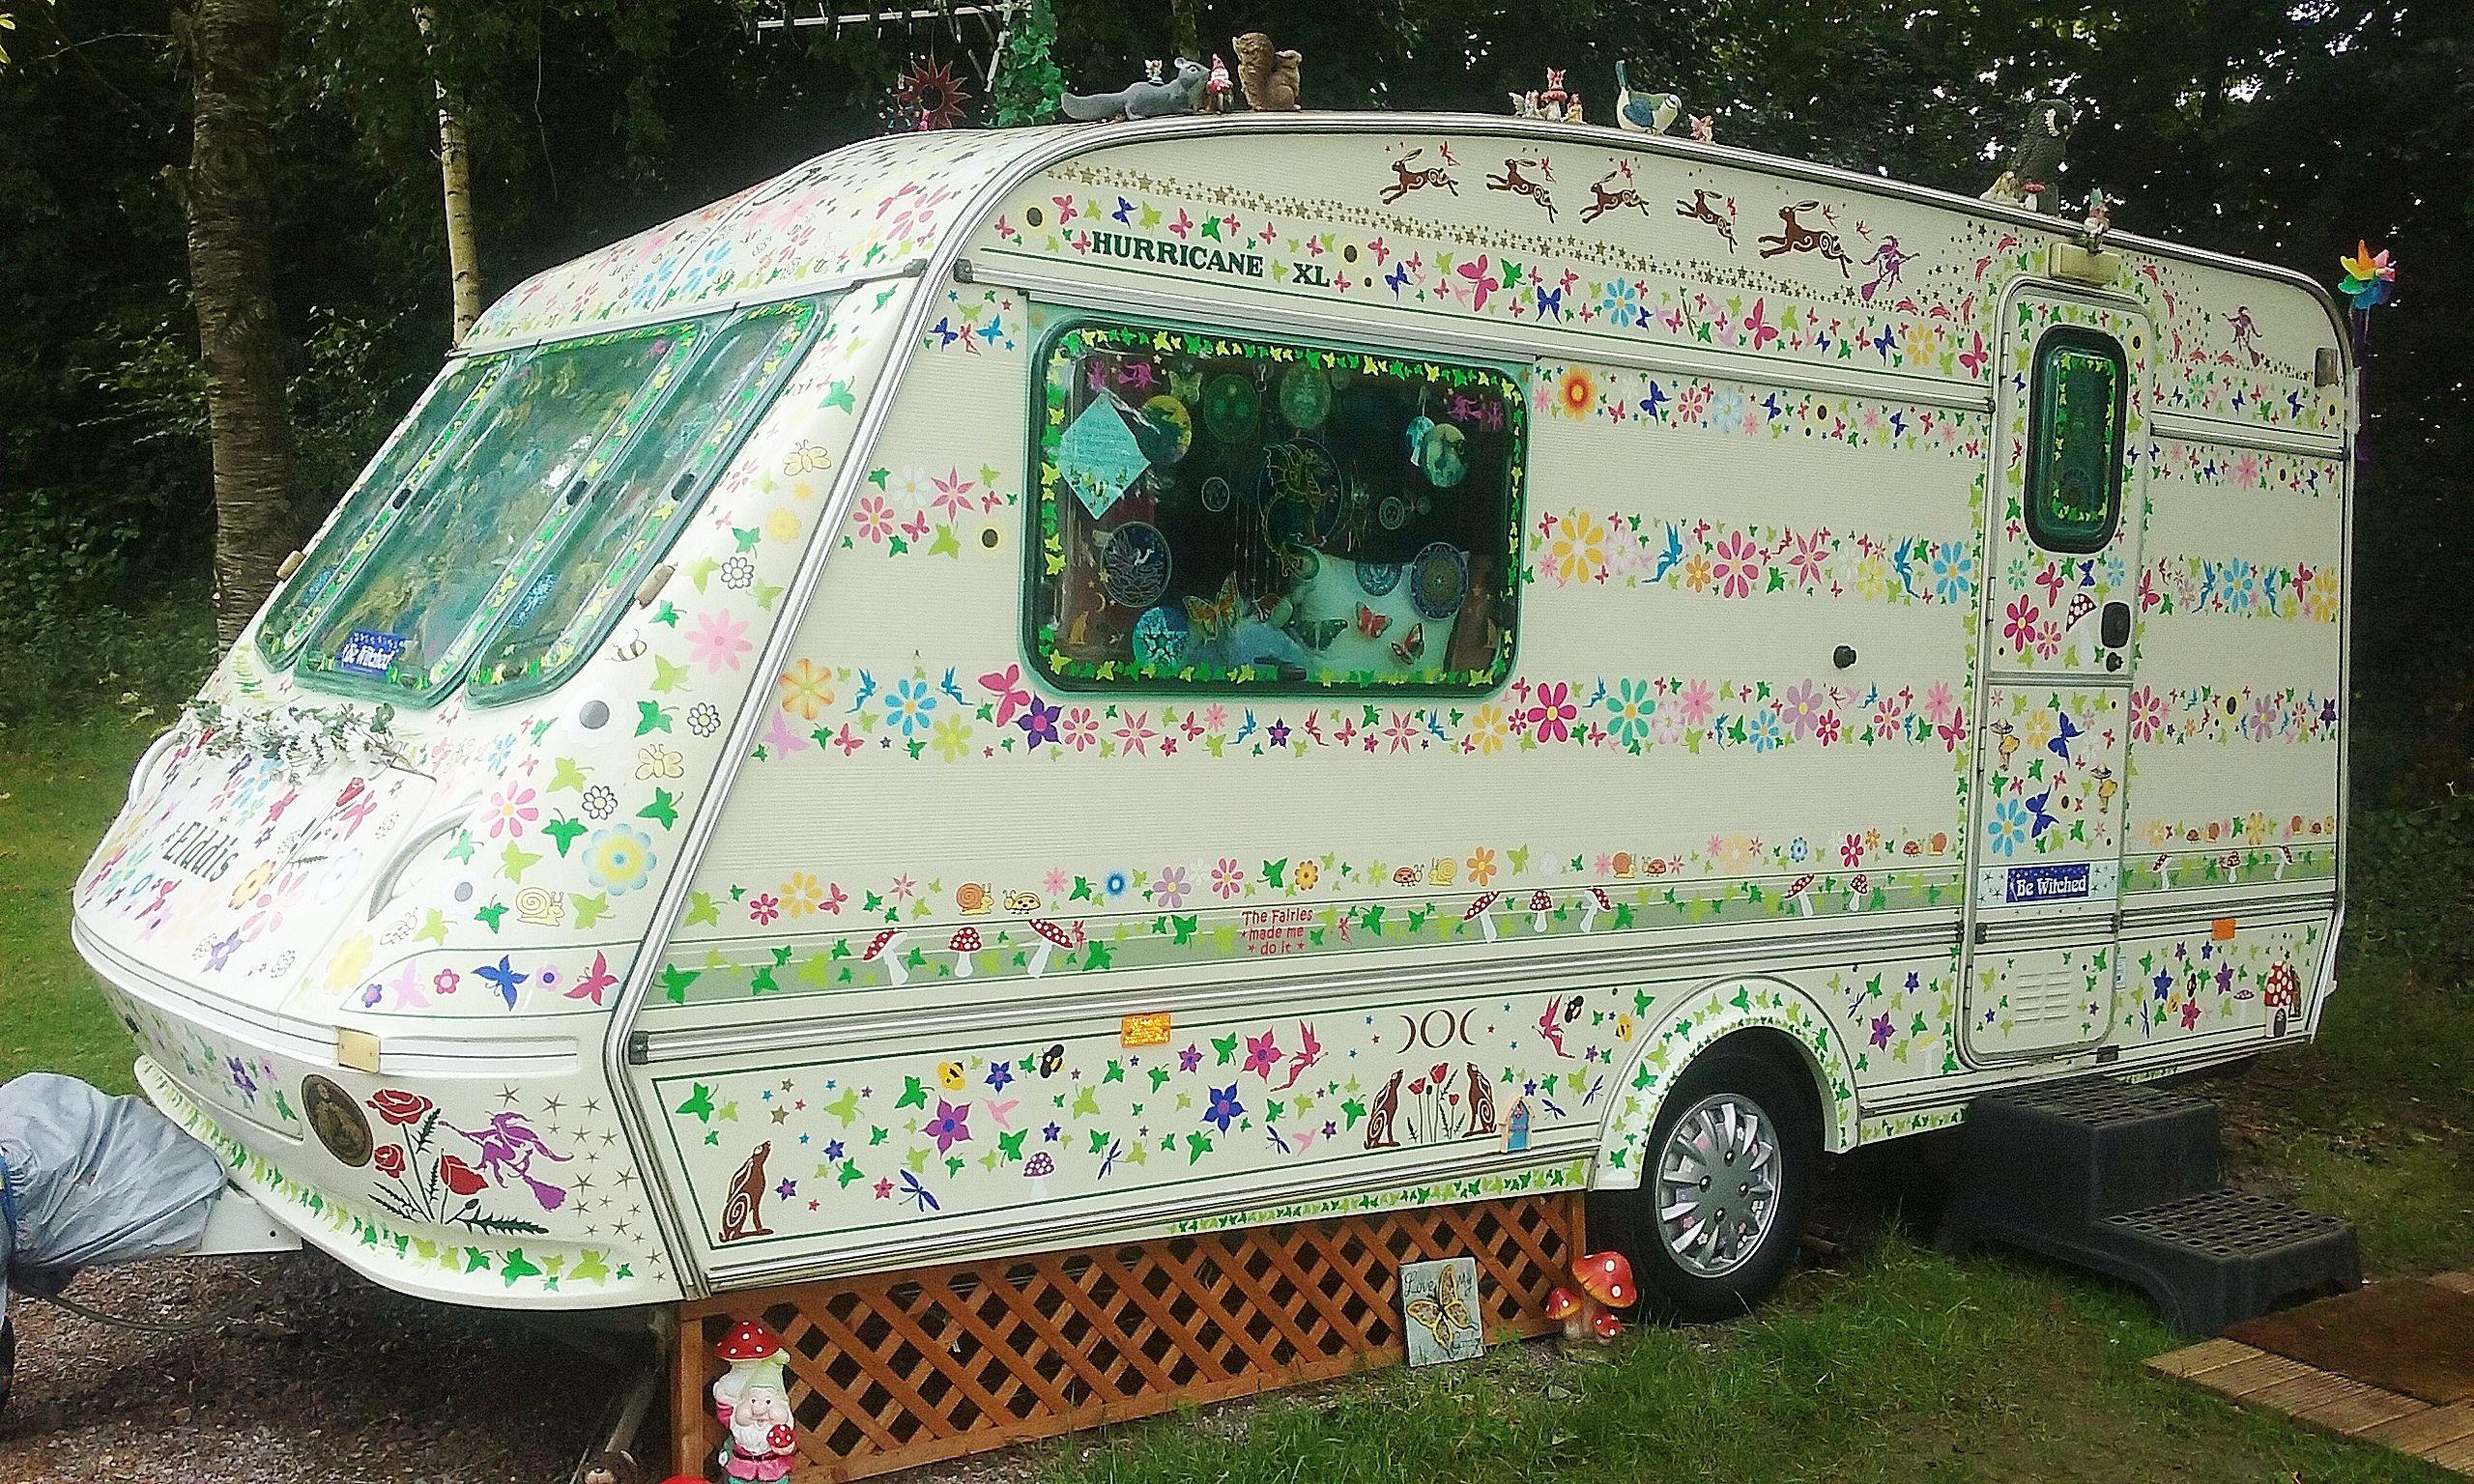 Funky Spiritual Flowery Caravan Car Graphics Stickers Decals By Hippy Motors Car Decal Hippie Spiritual Decals Car [ 1536 x 2560 Pixel ]